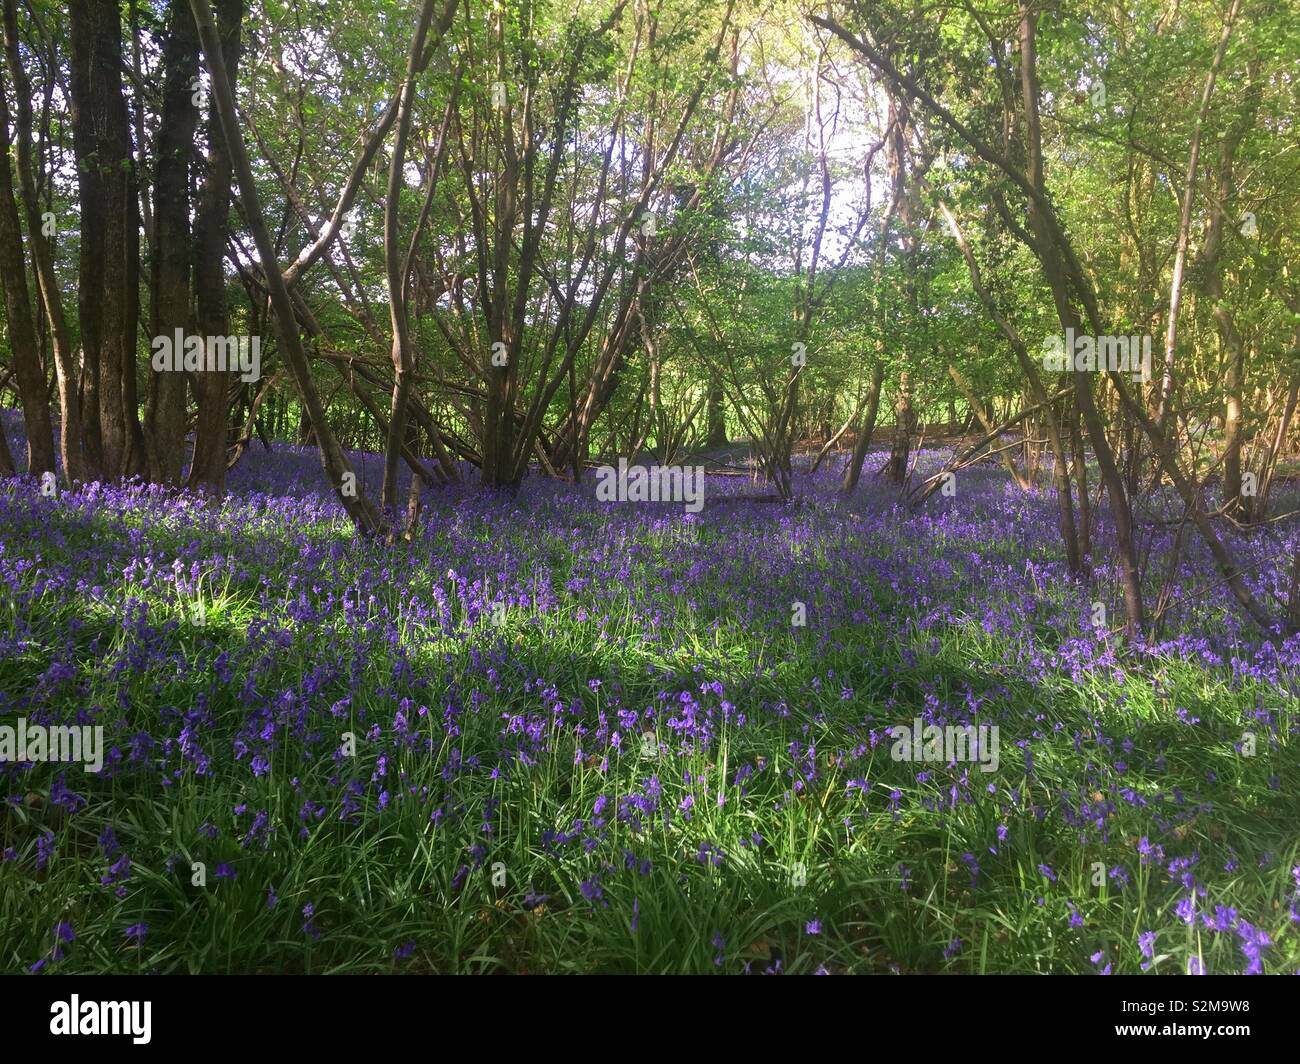 Bluebell woods - Stock Image